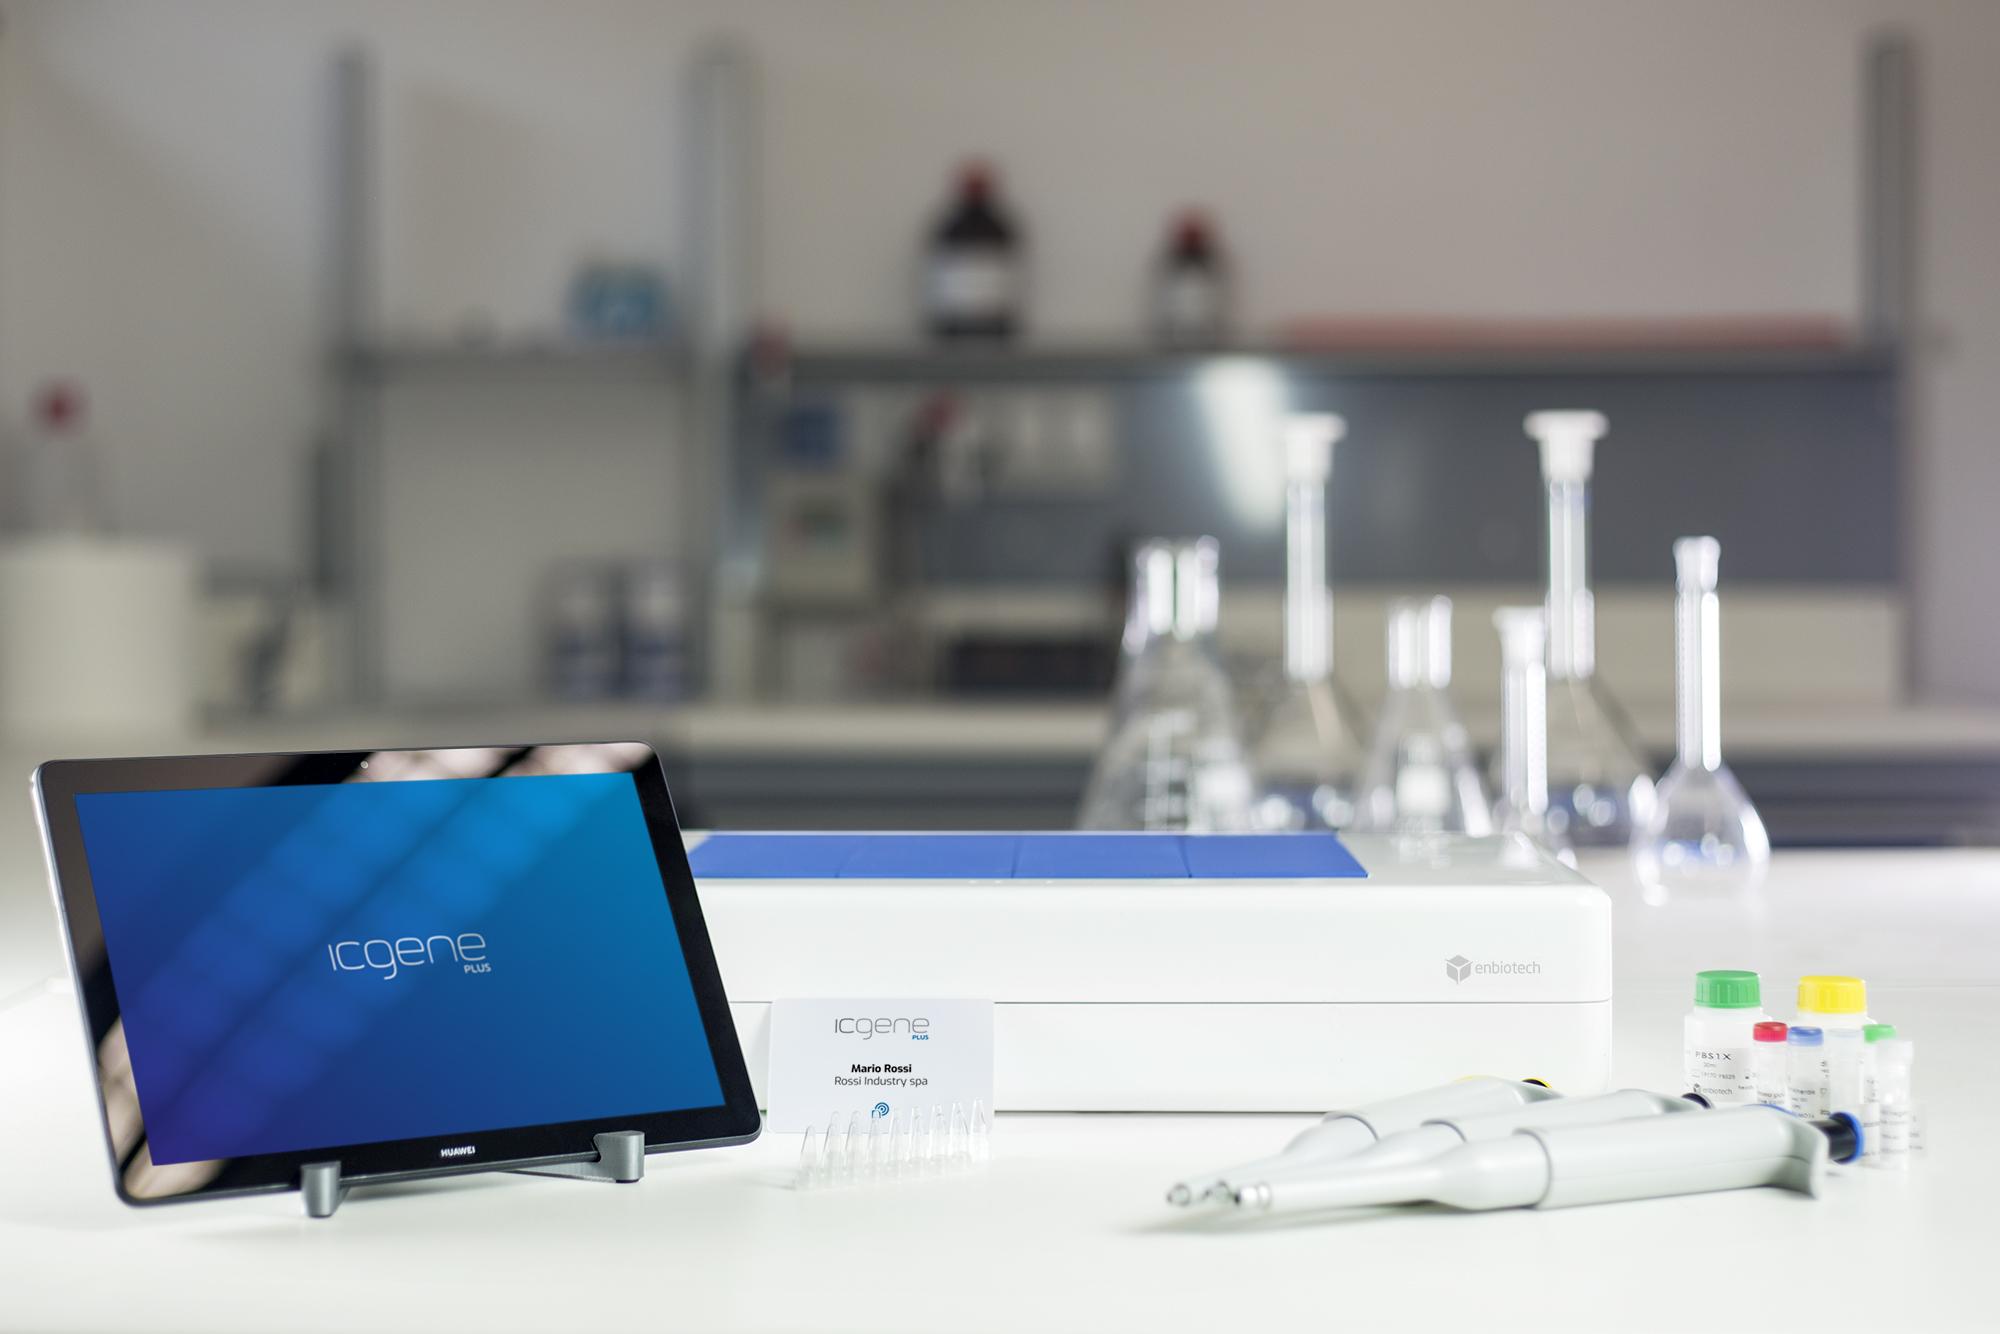 icgene innovative system